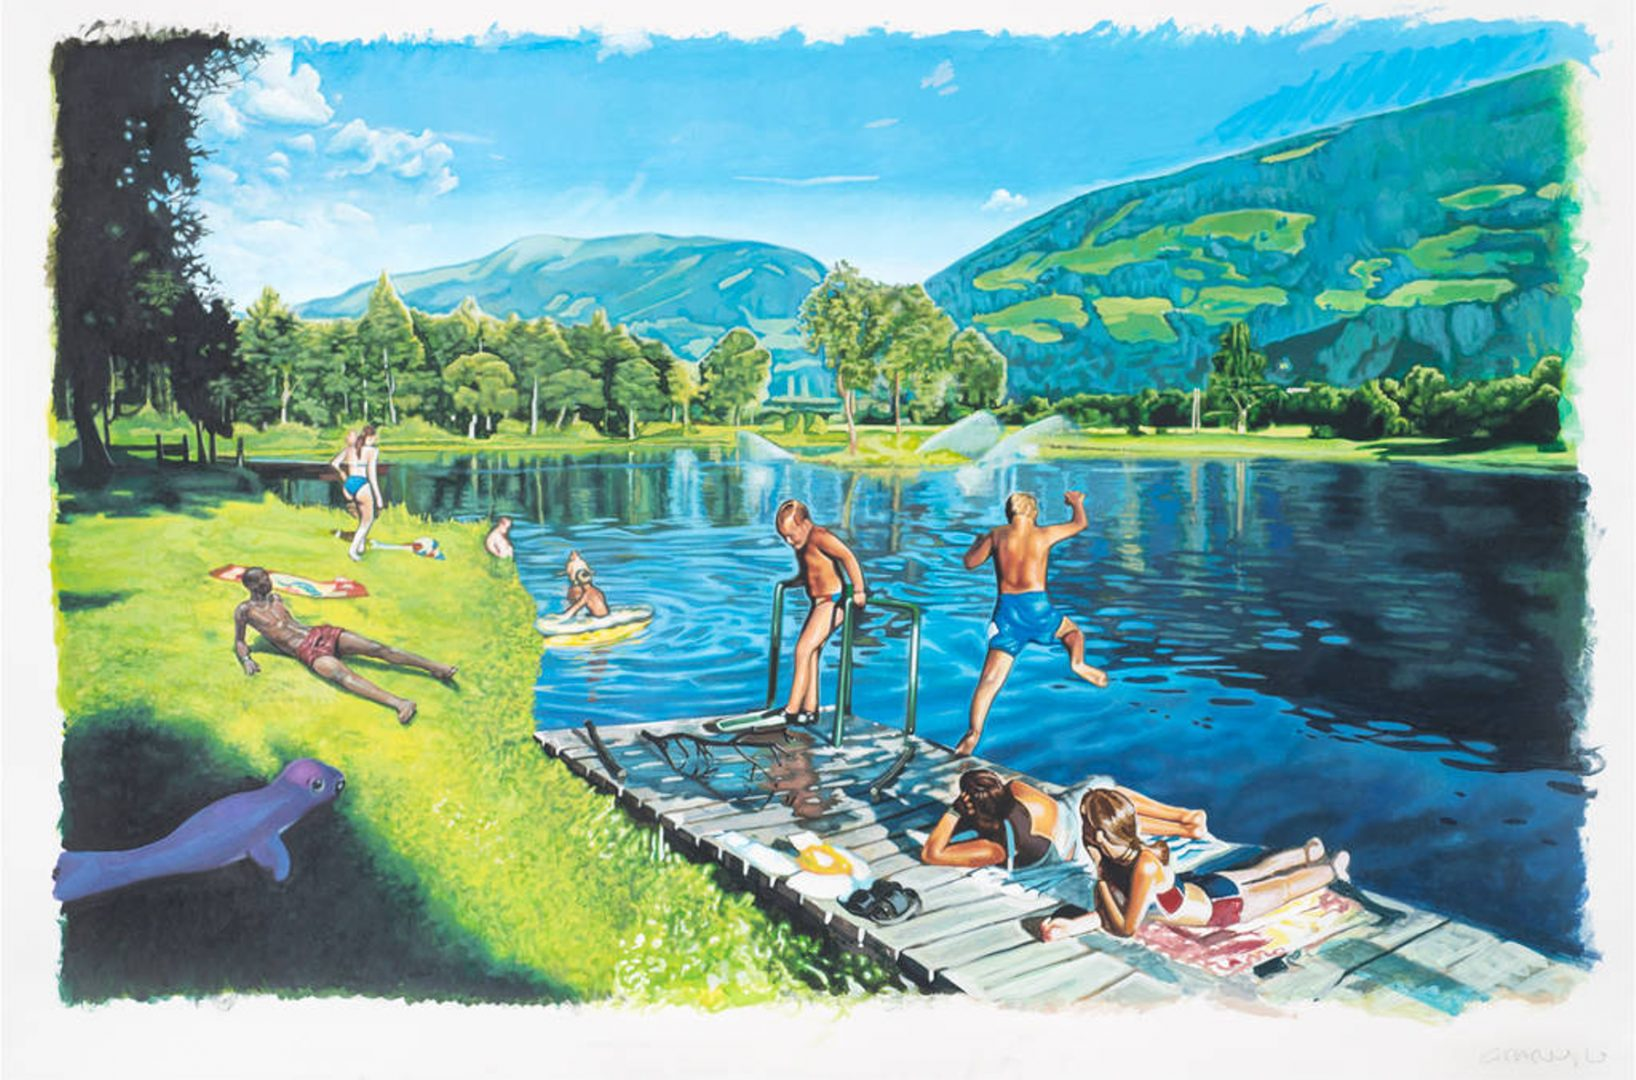 Paris Giachoustidis, OHNE HANDTUCH AM BERGSEE, 2020, Acrylfarbe auf Papier, 95 x 125 cm